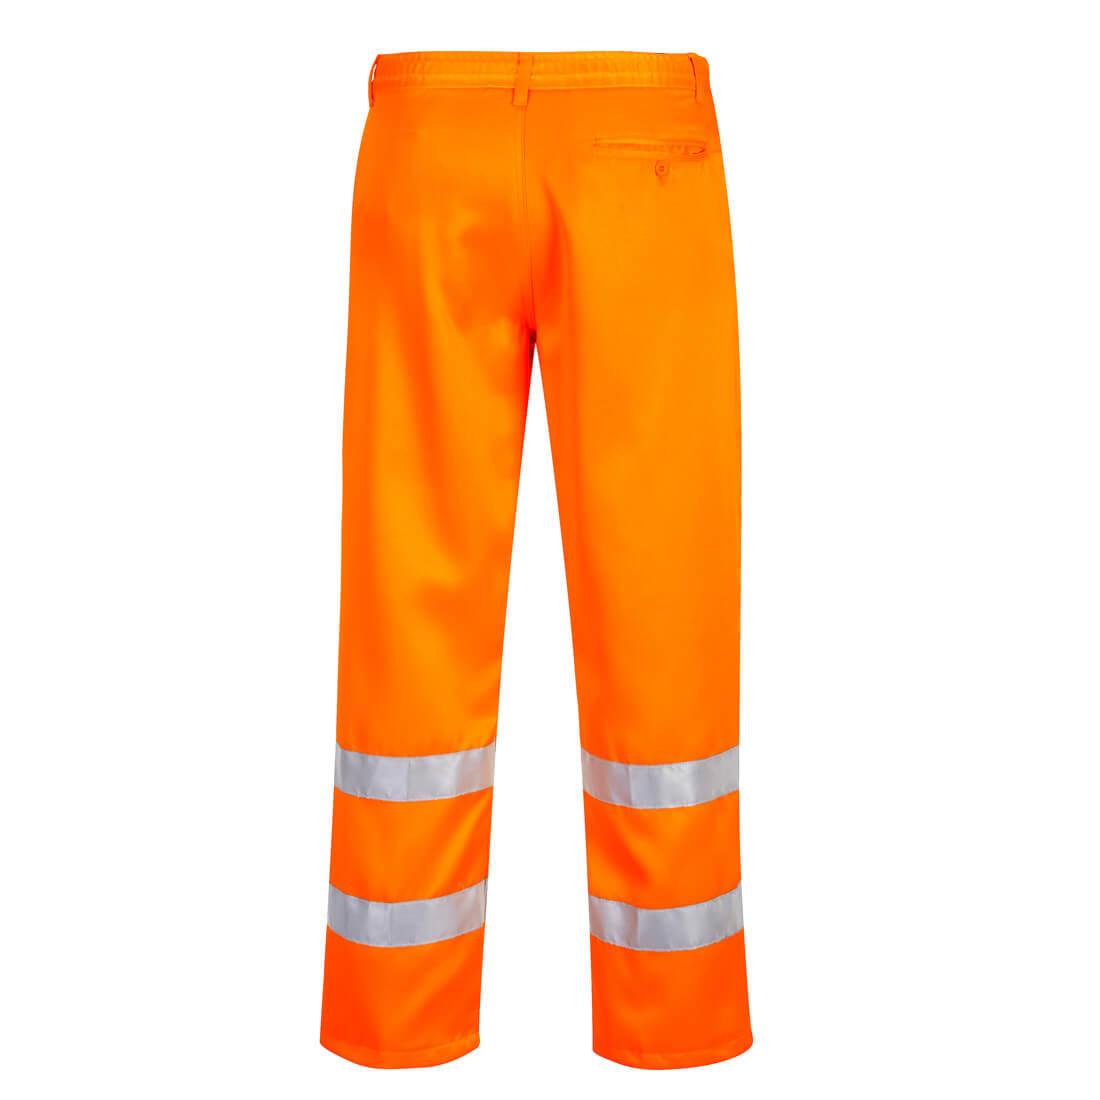 Pantaloni HiVis Poli Bumbac - Imbracaminte de protectie